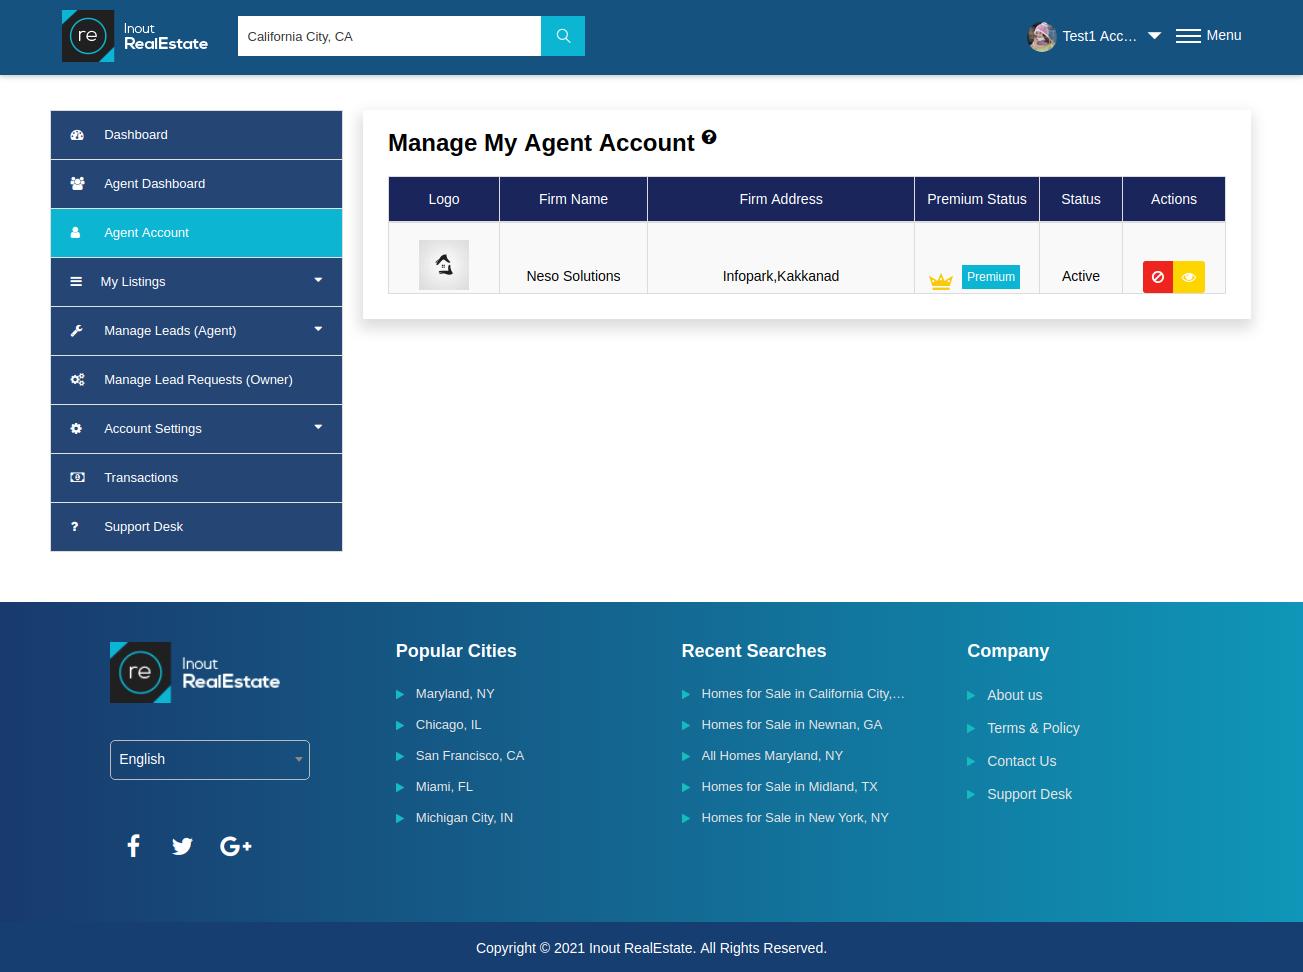 Inout RealEstate - Map Based Advanced Real Estate Portal - Screenshot 7